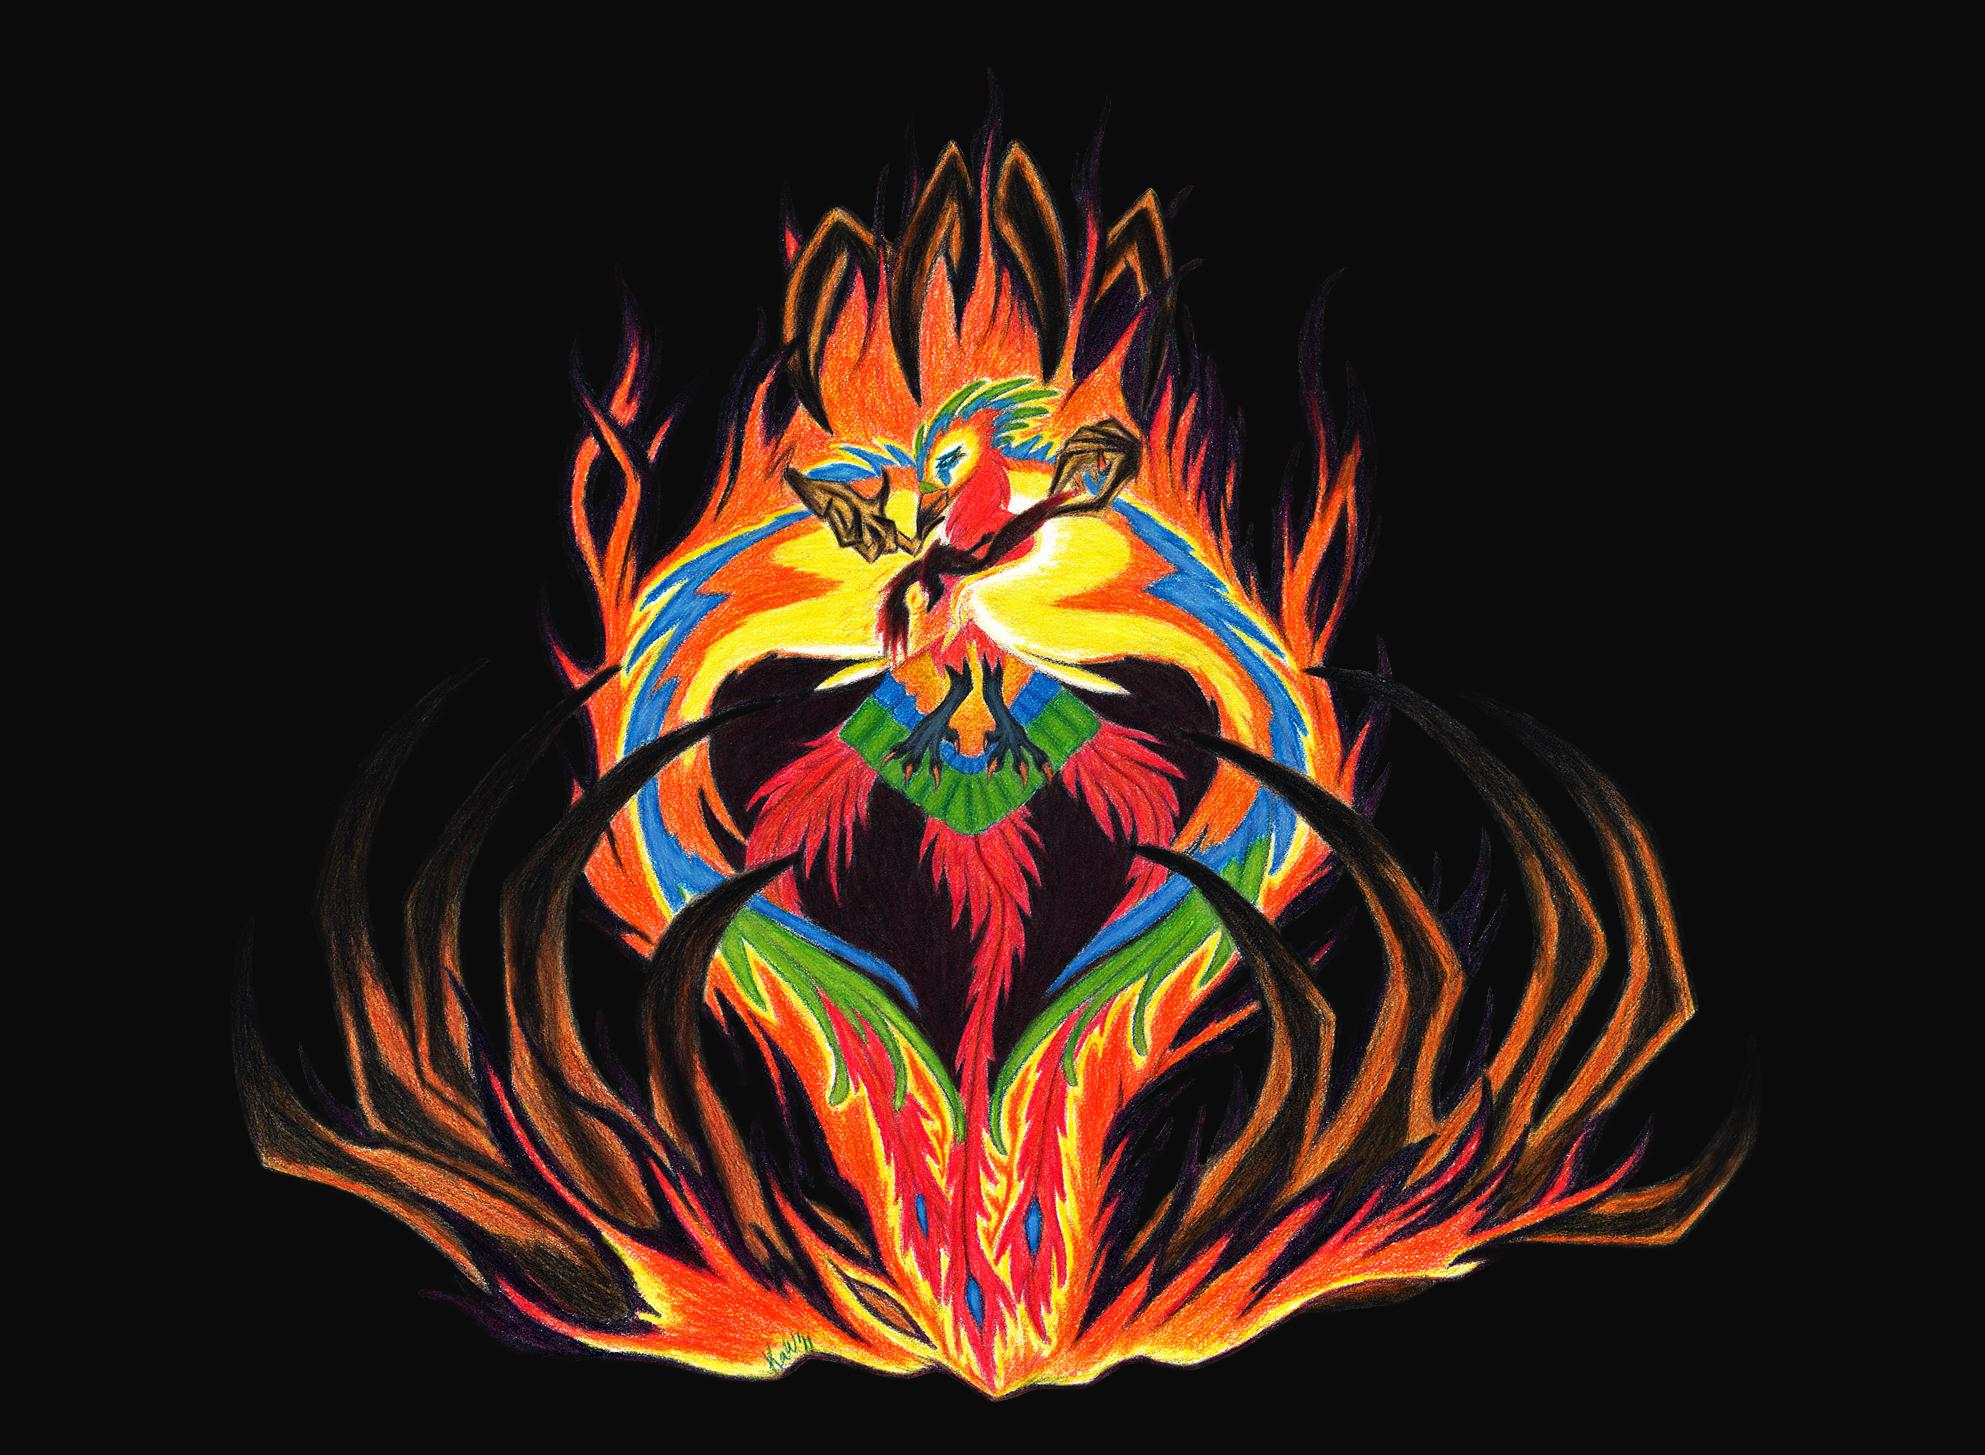 Disheartened Flame